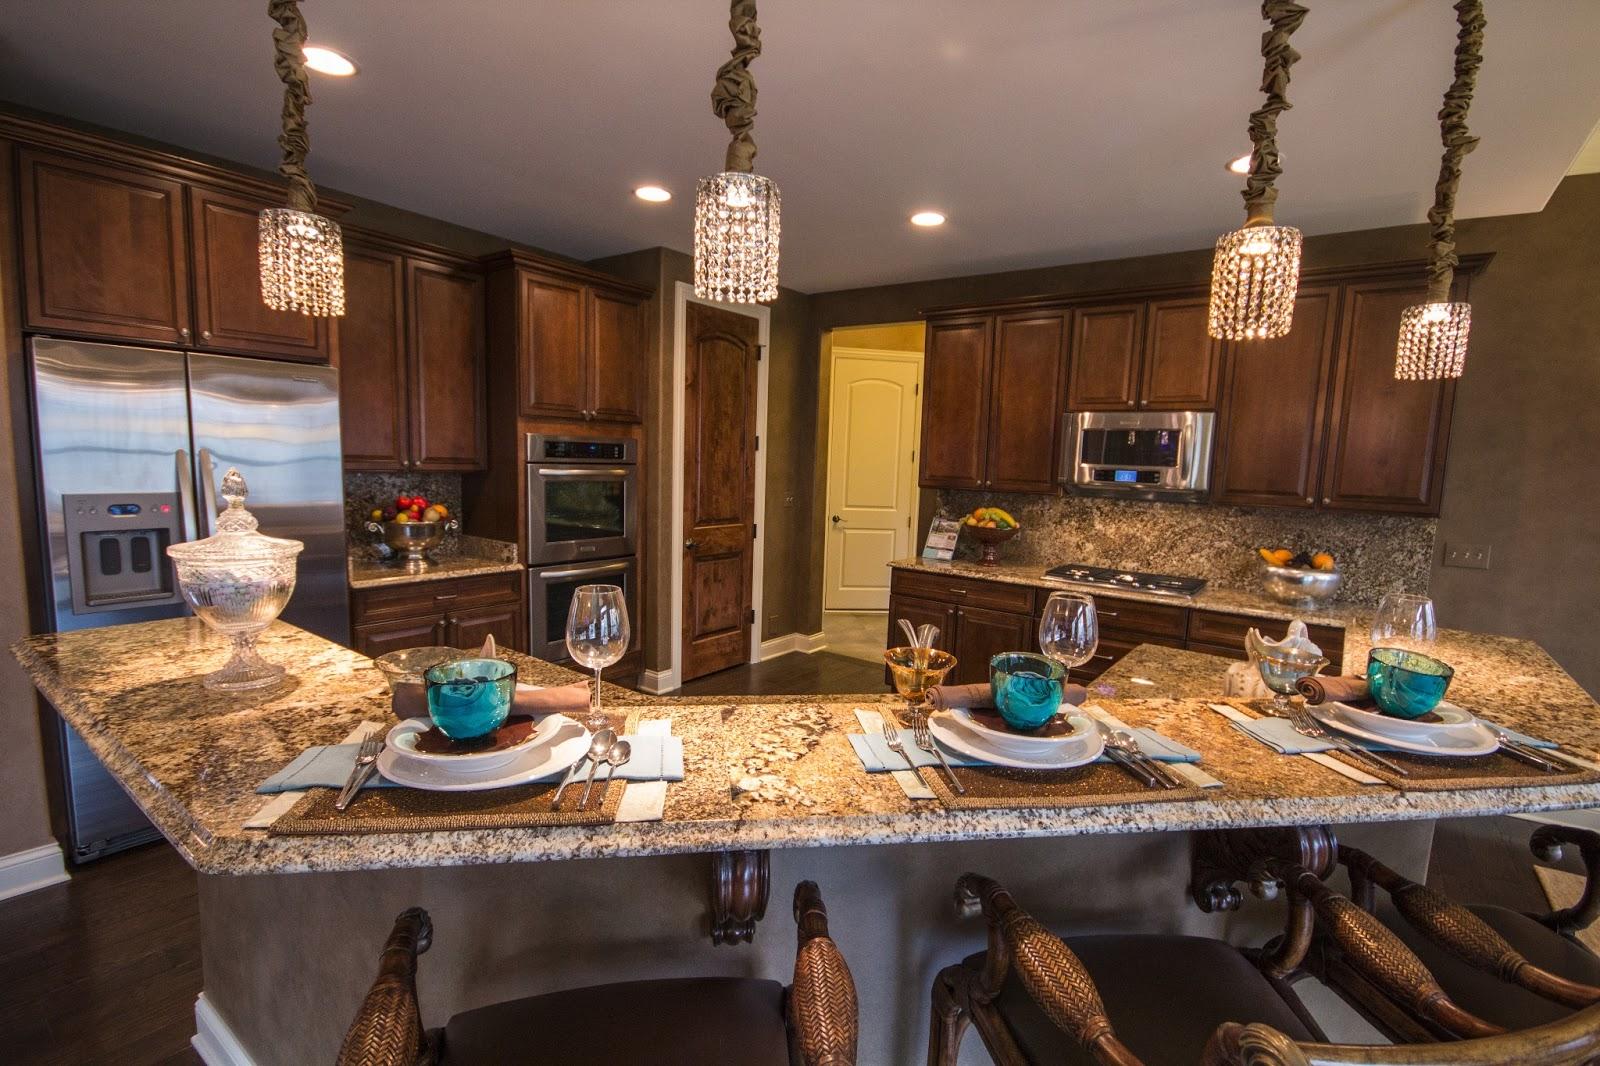 corian countertops corian kitchen countertops kitchen countertops benefits of granite quartz and corian